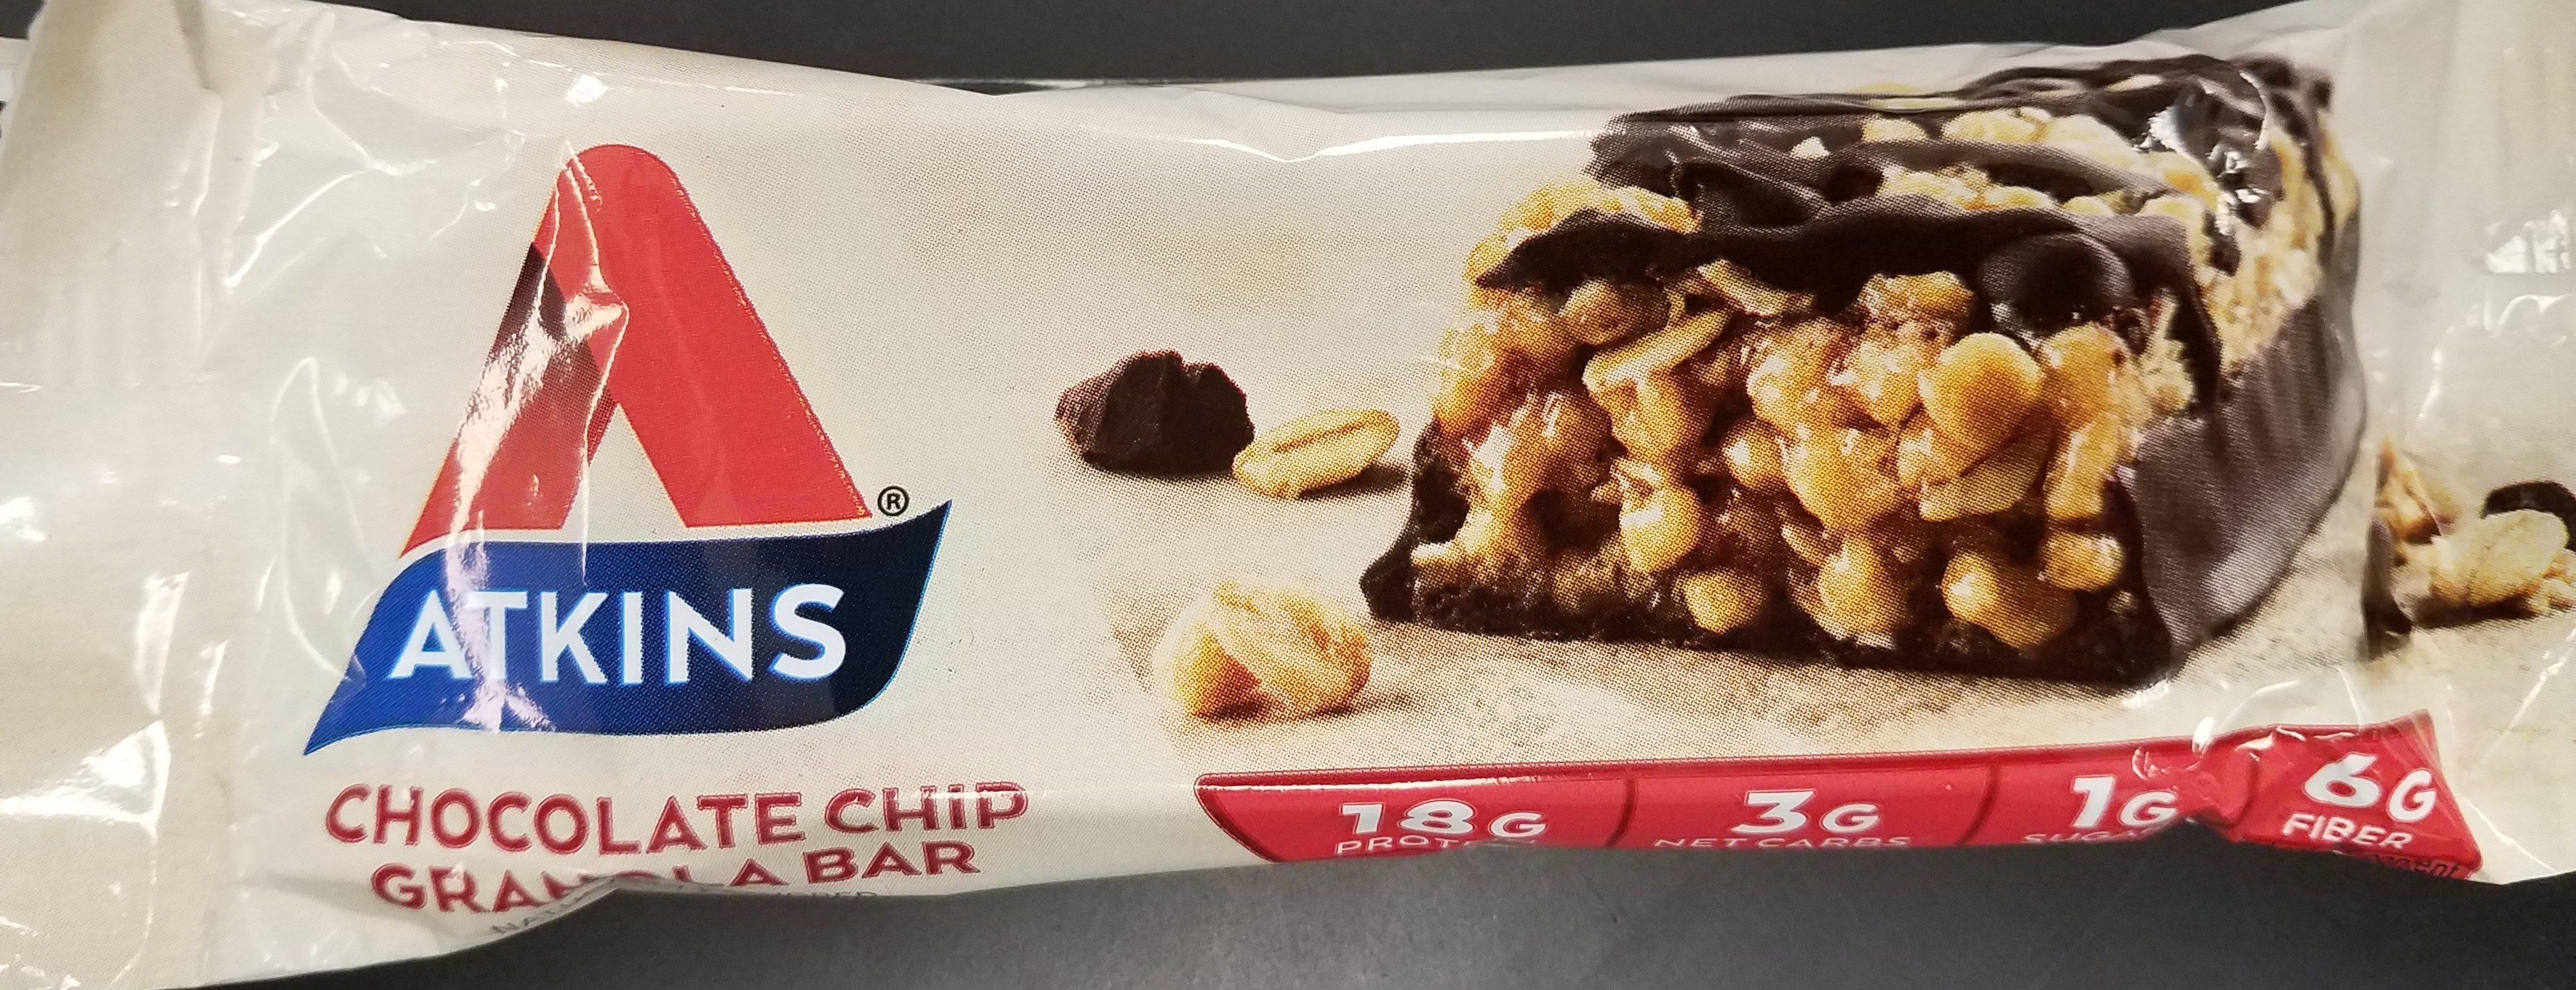 Chocolate Chip Granola Bar - Product - en